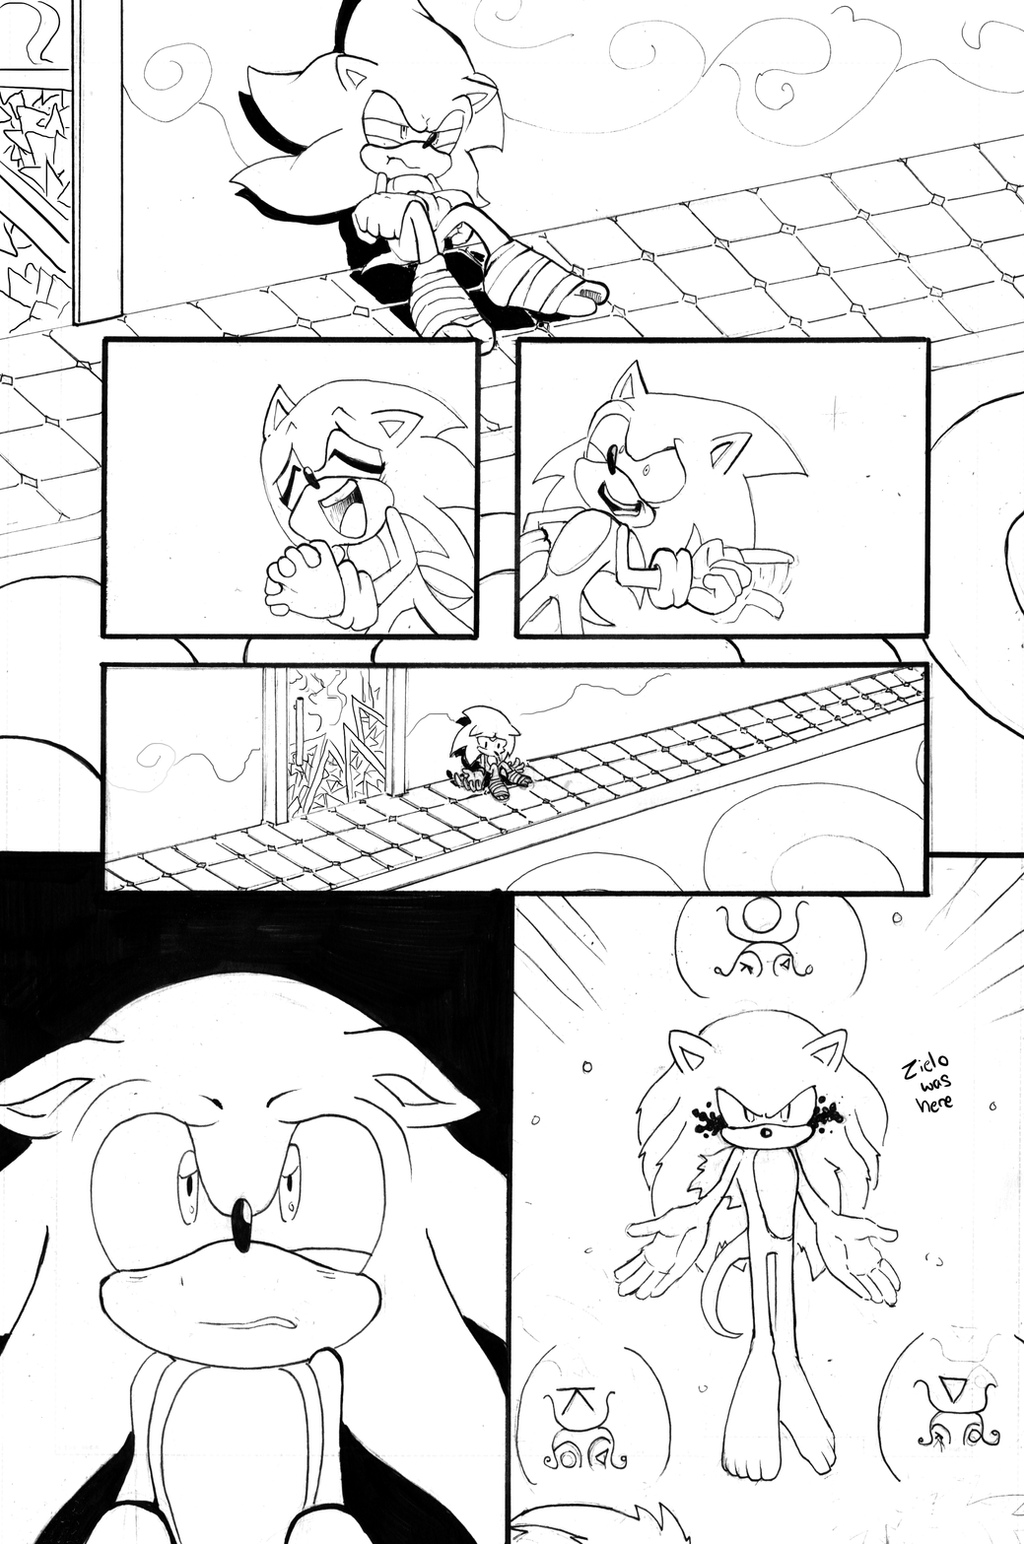 TMOM Issue 10 INKS by Gigi-D